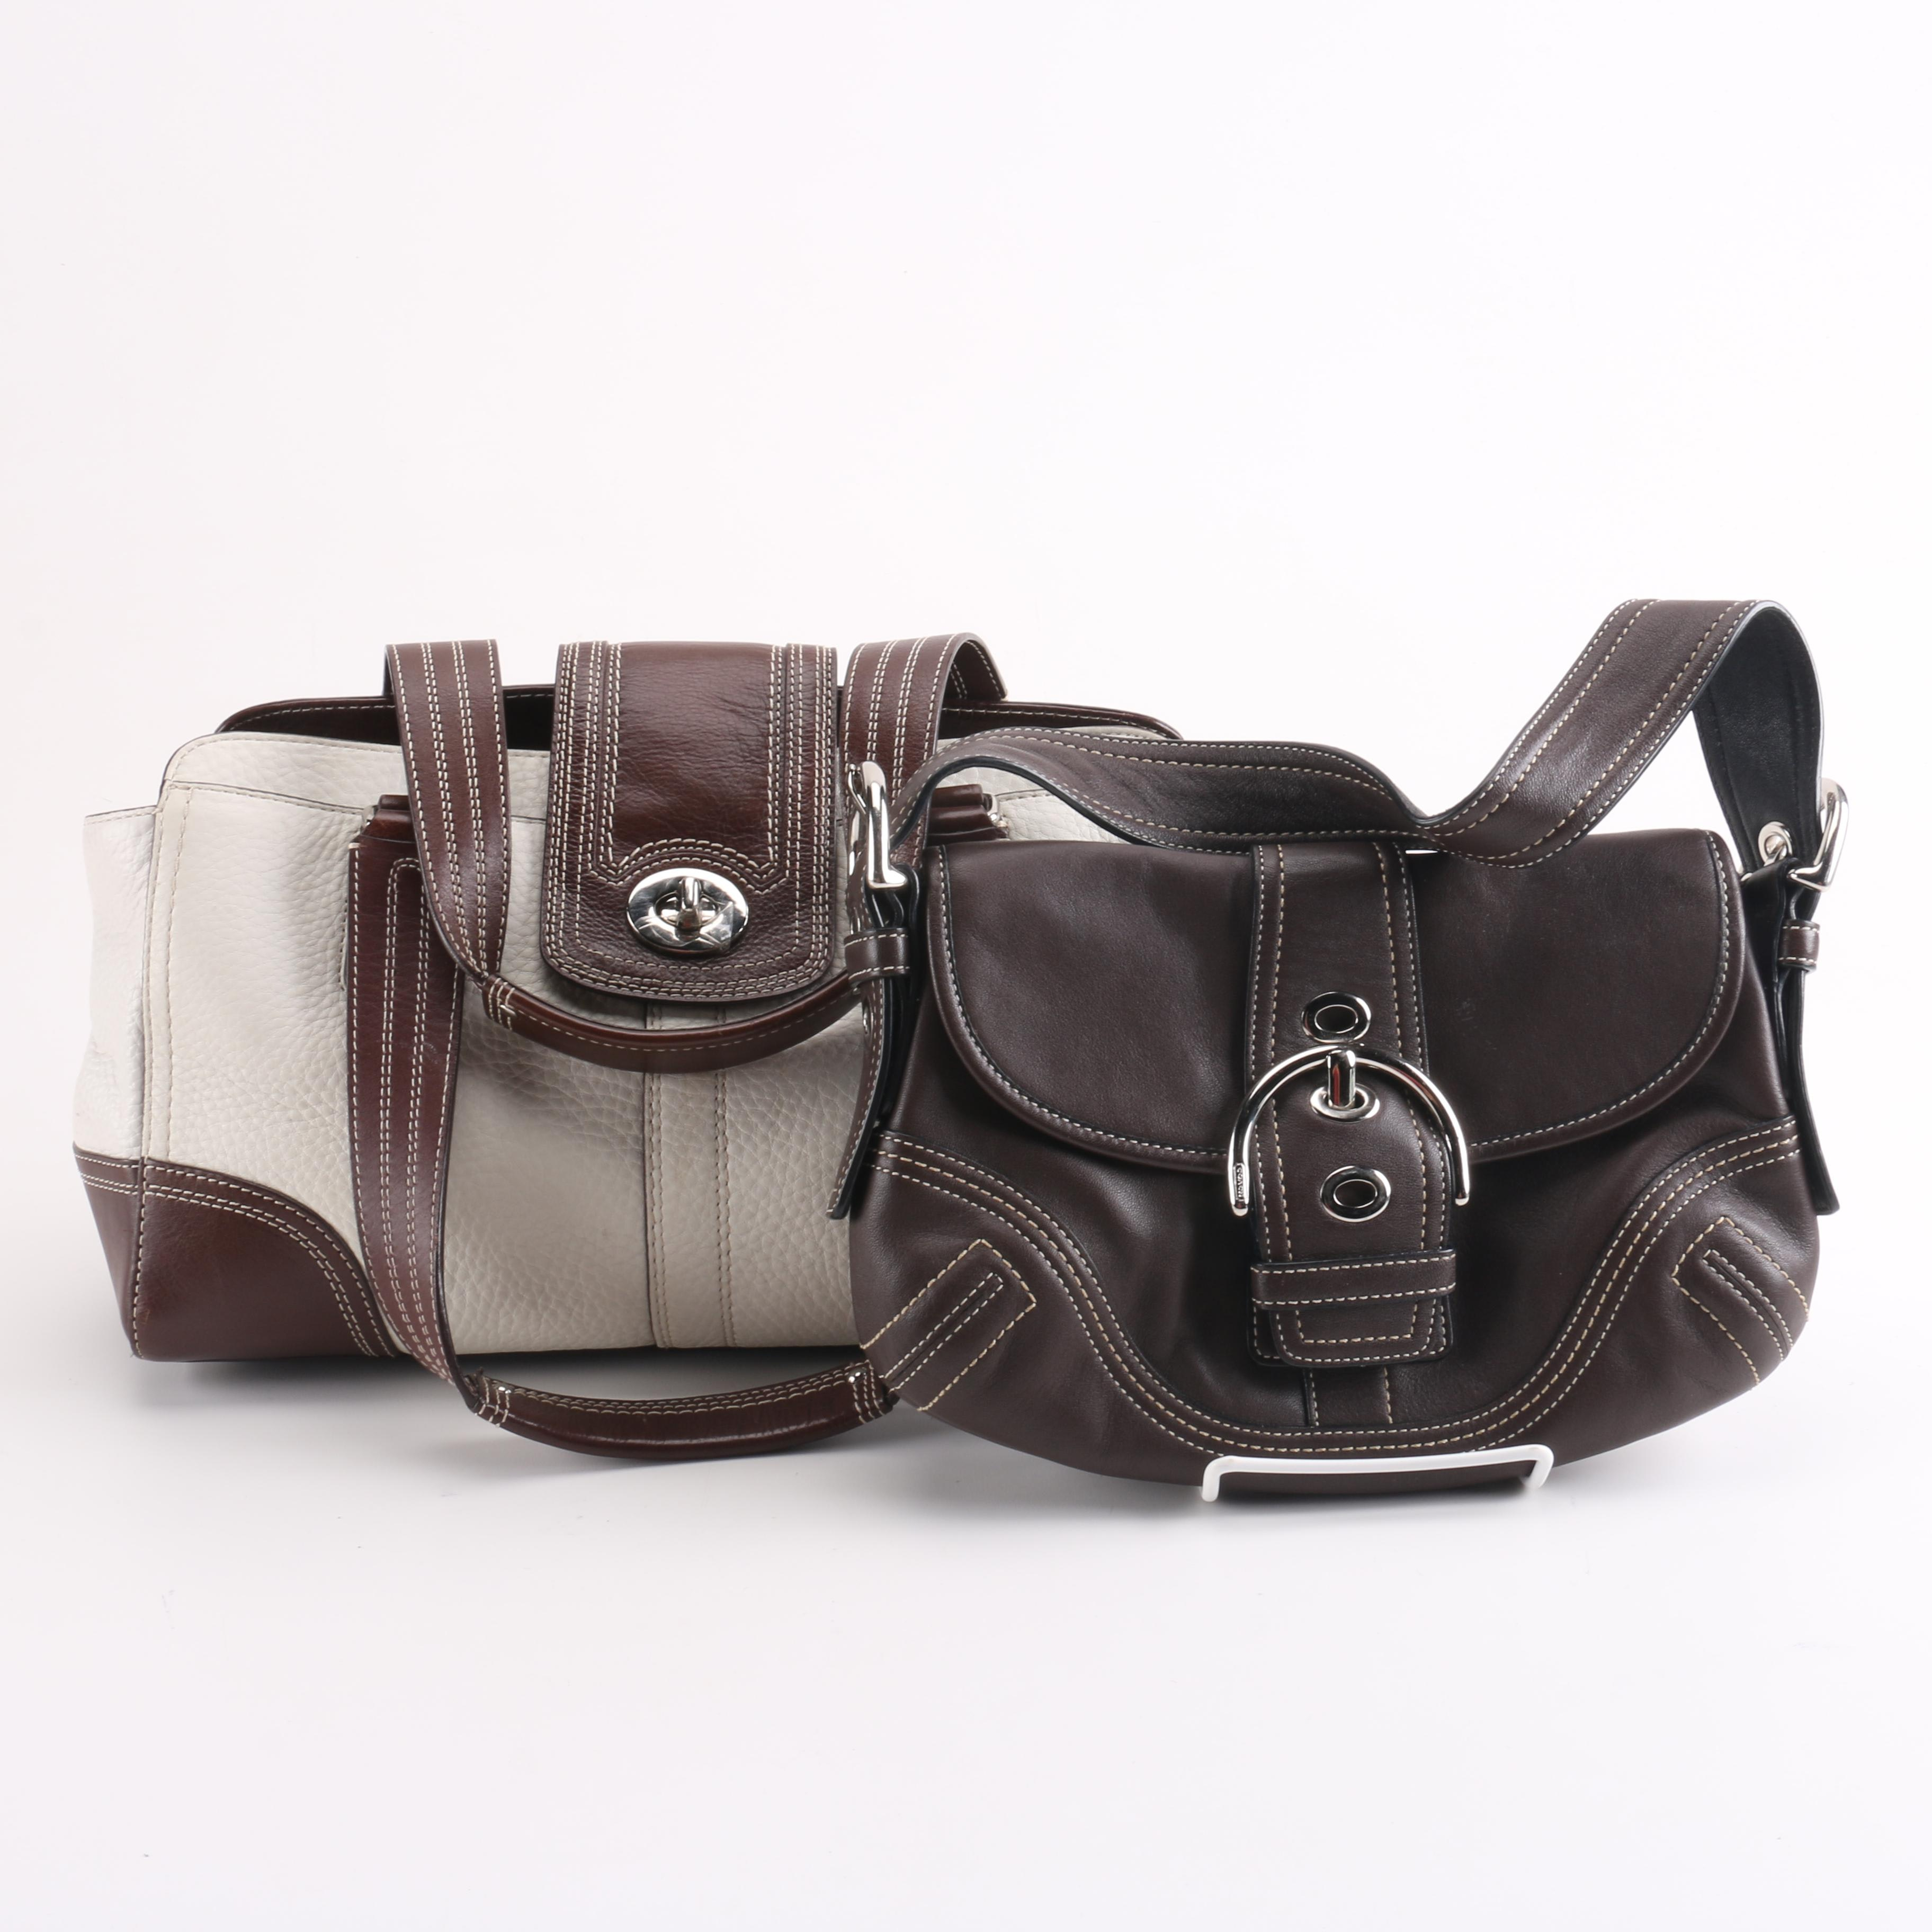 Coach Hamptons Satchel and Soho Buckle Flap Handbags